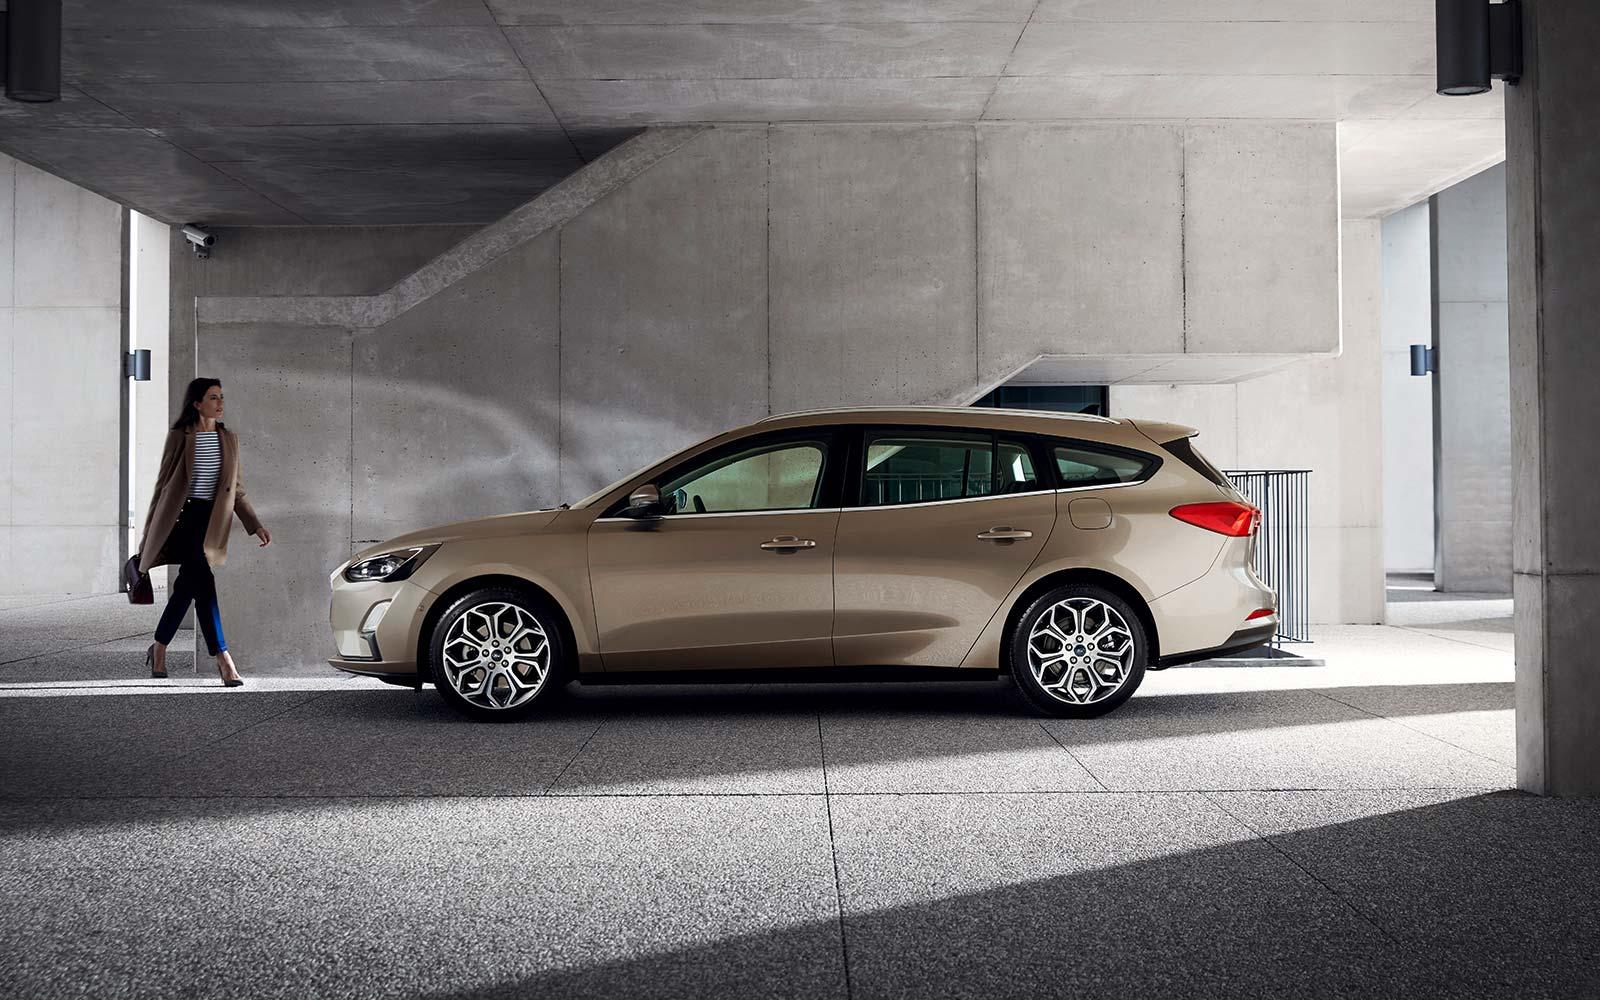 2019-4th-generation-Ford-Focus-estate